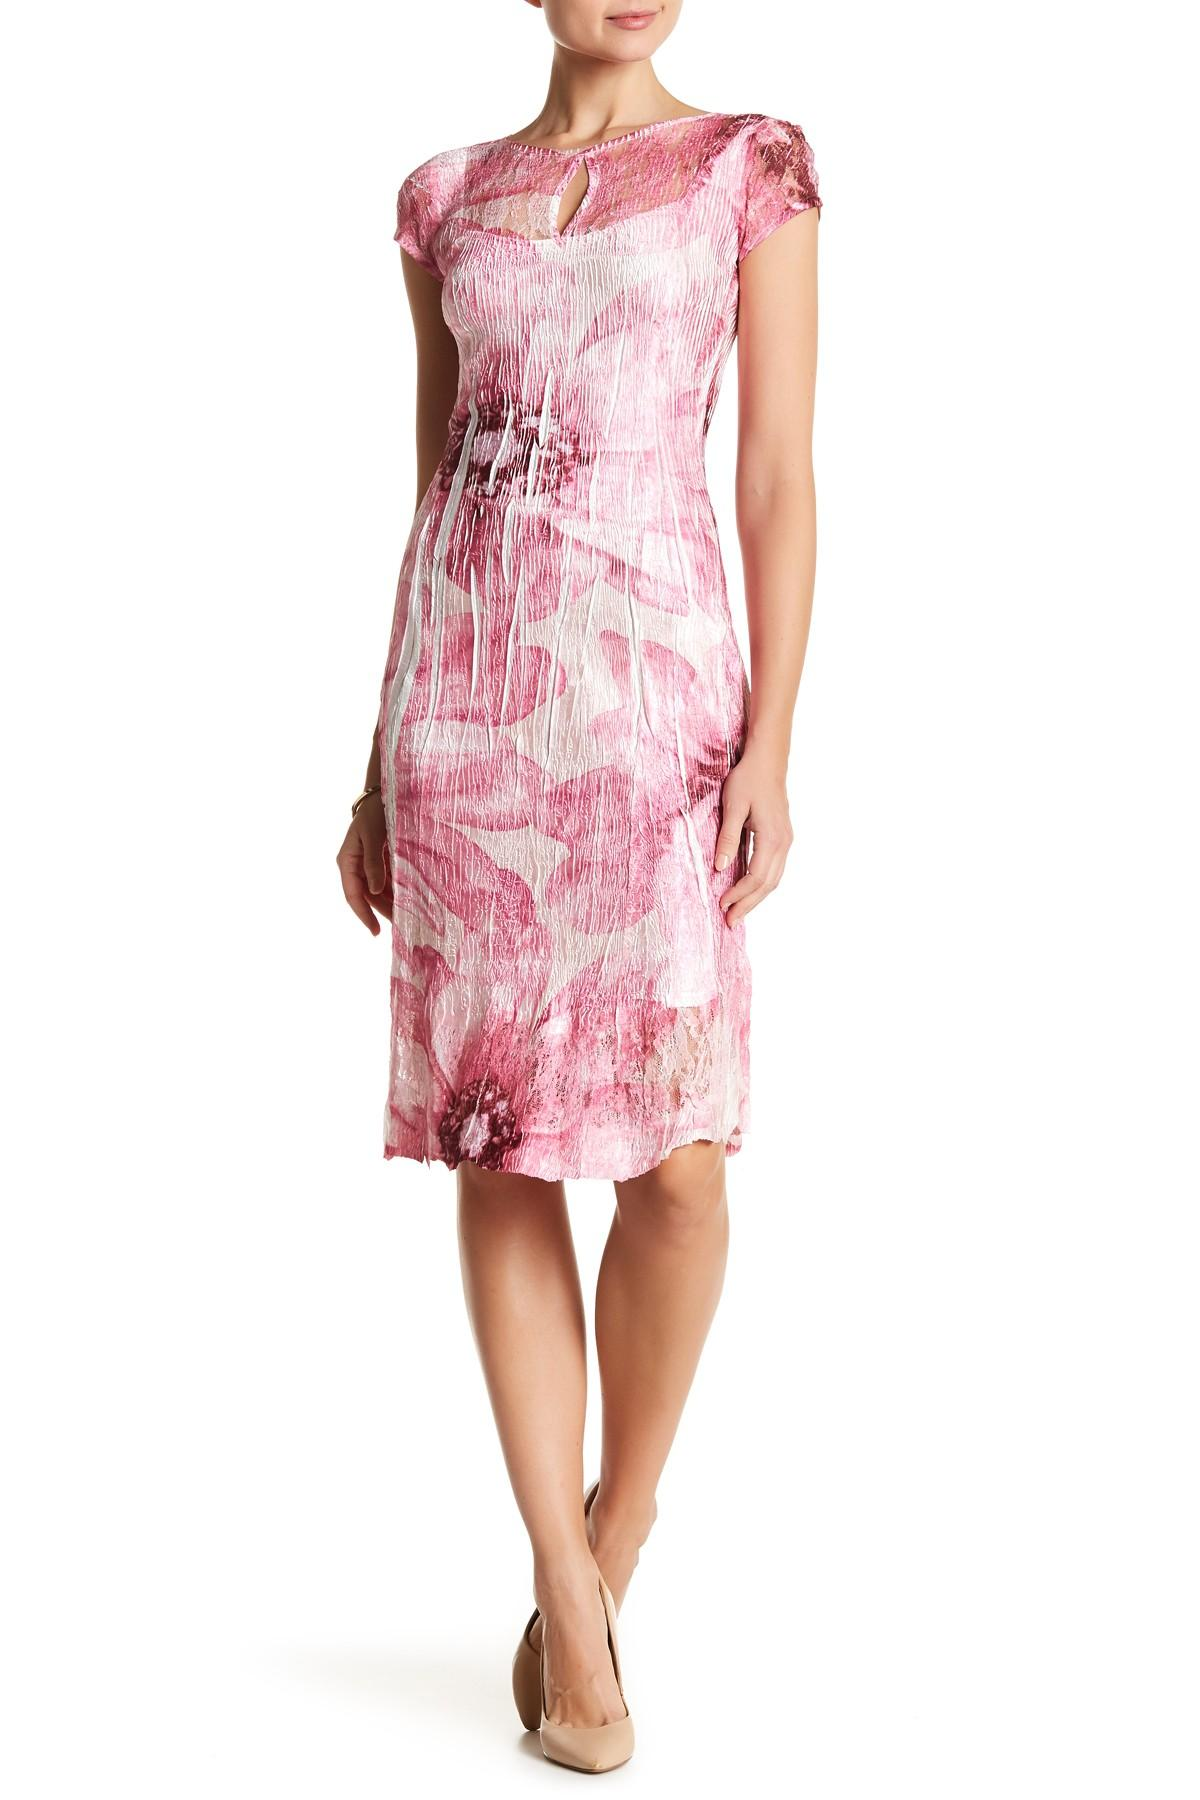 Lyst Komarov Cap Sleeve Keyhole Dress In Pink